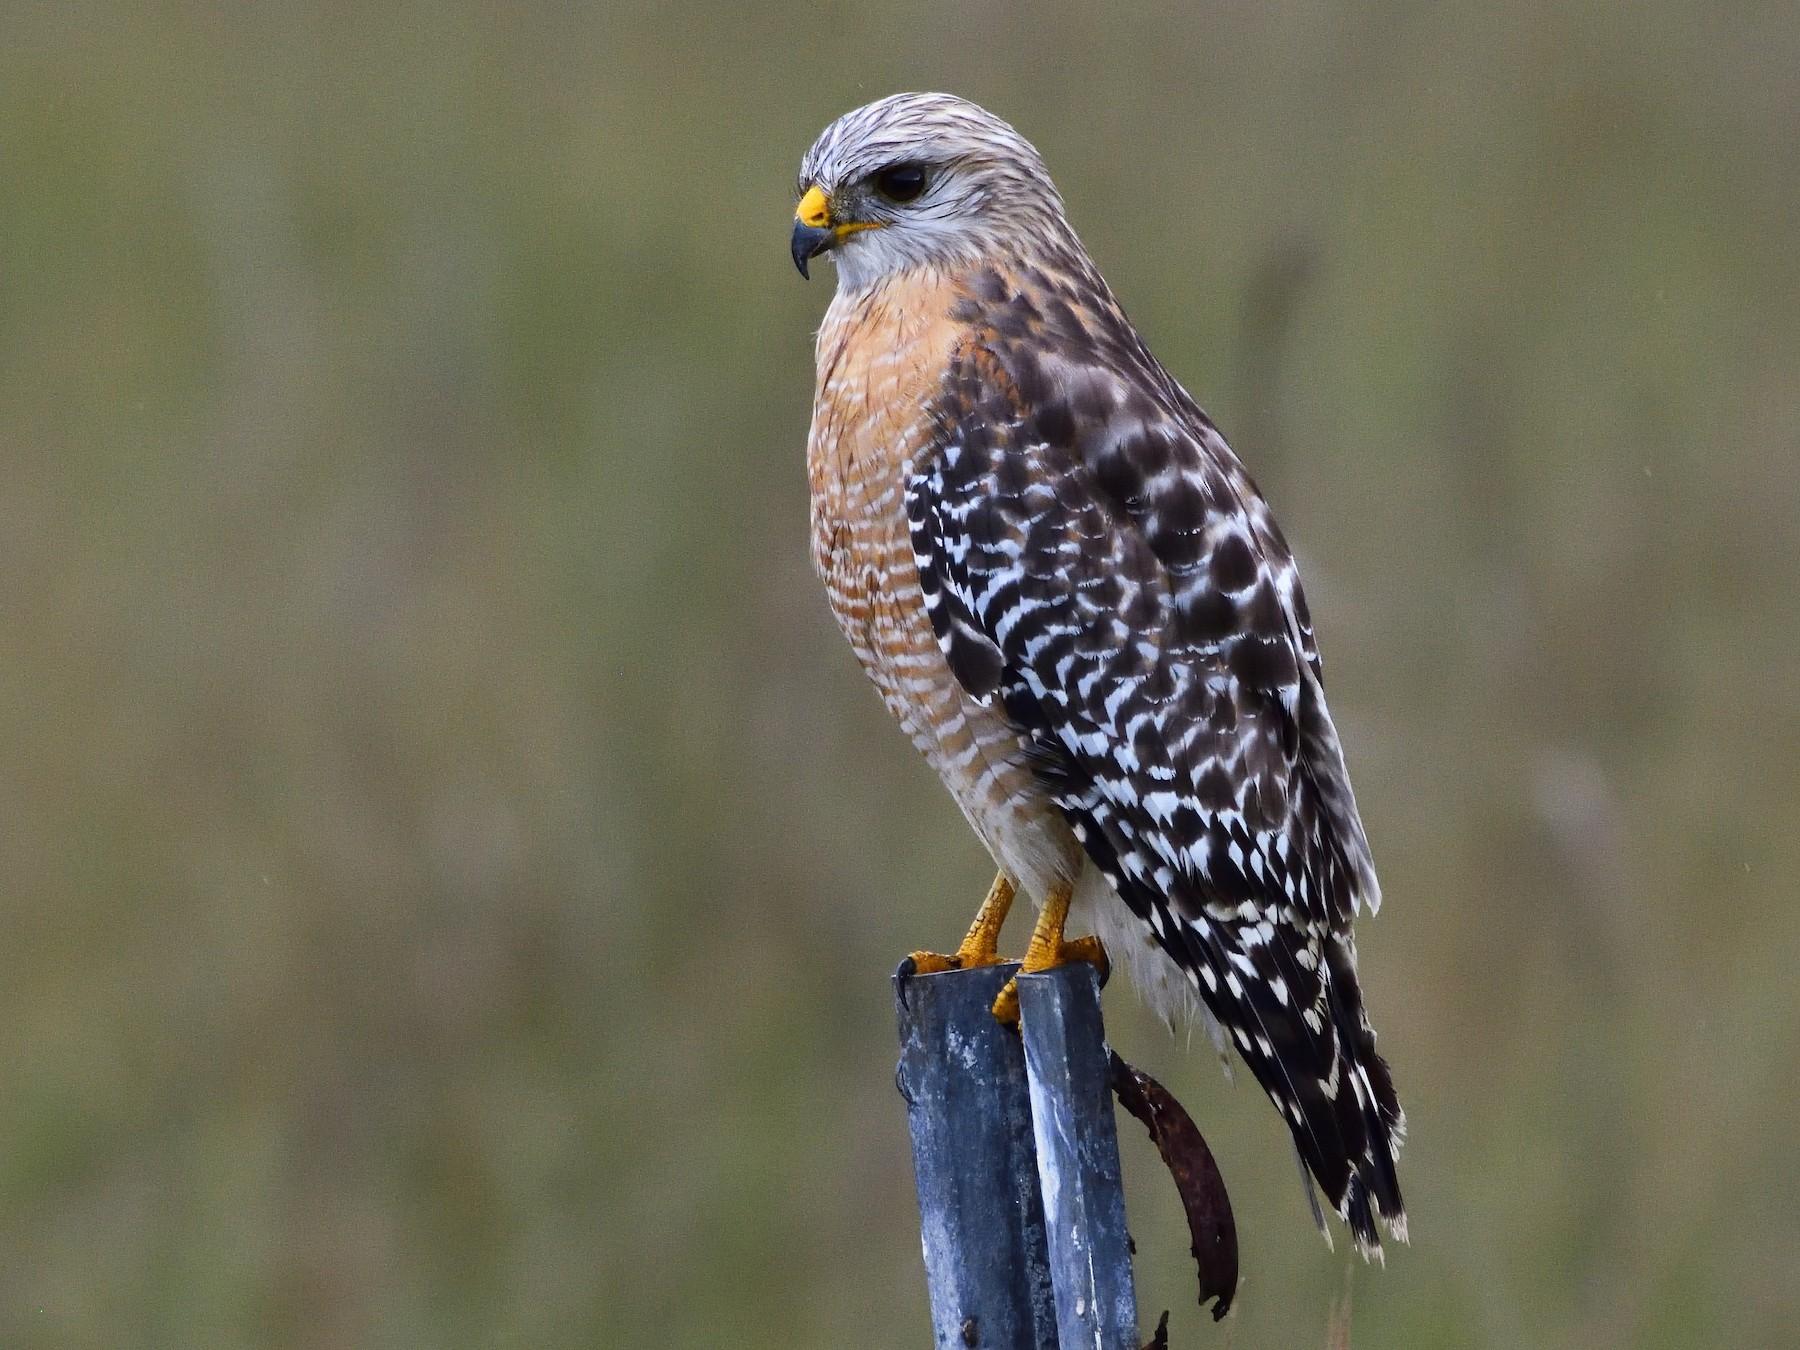 Red-shouldered Hawk - Ad Konings